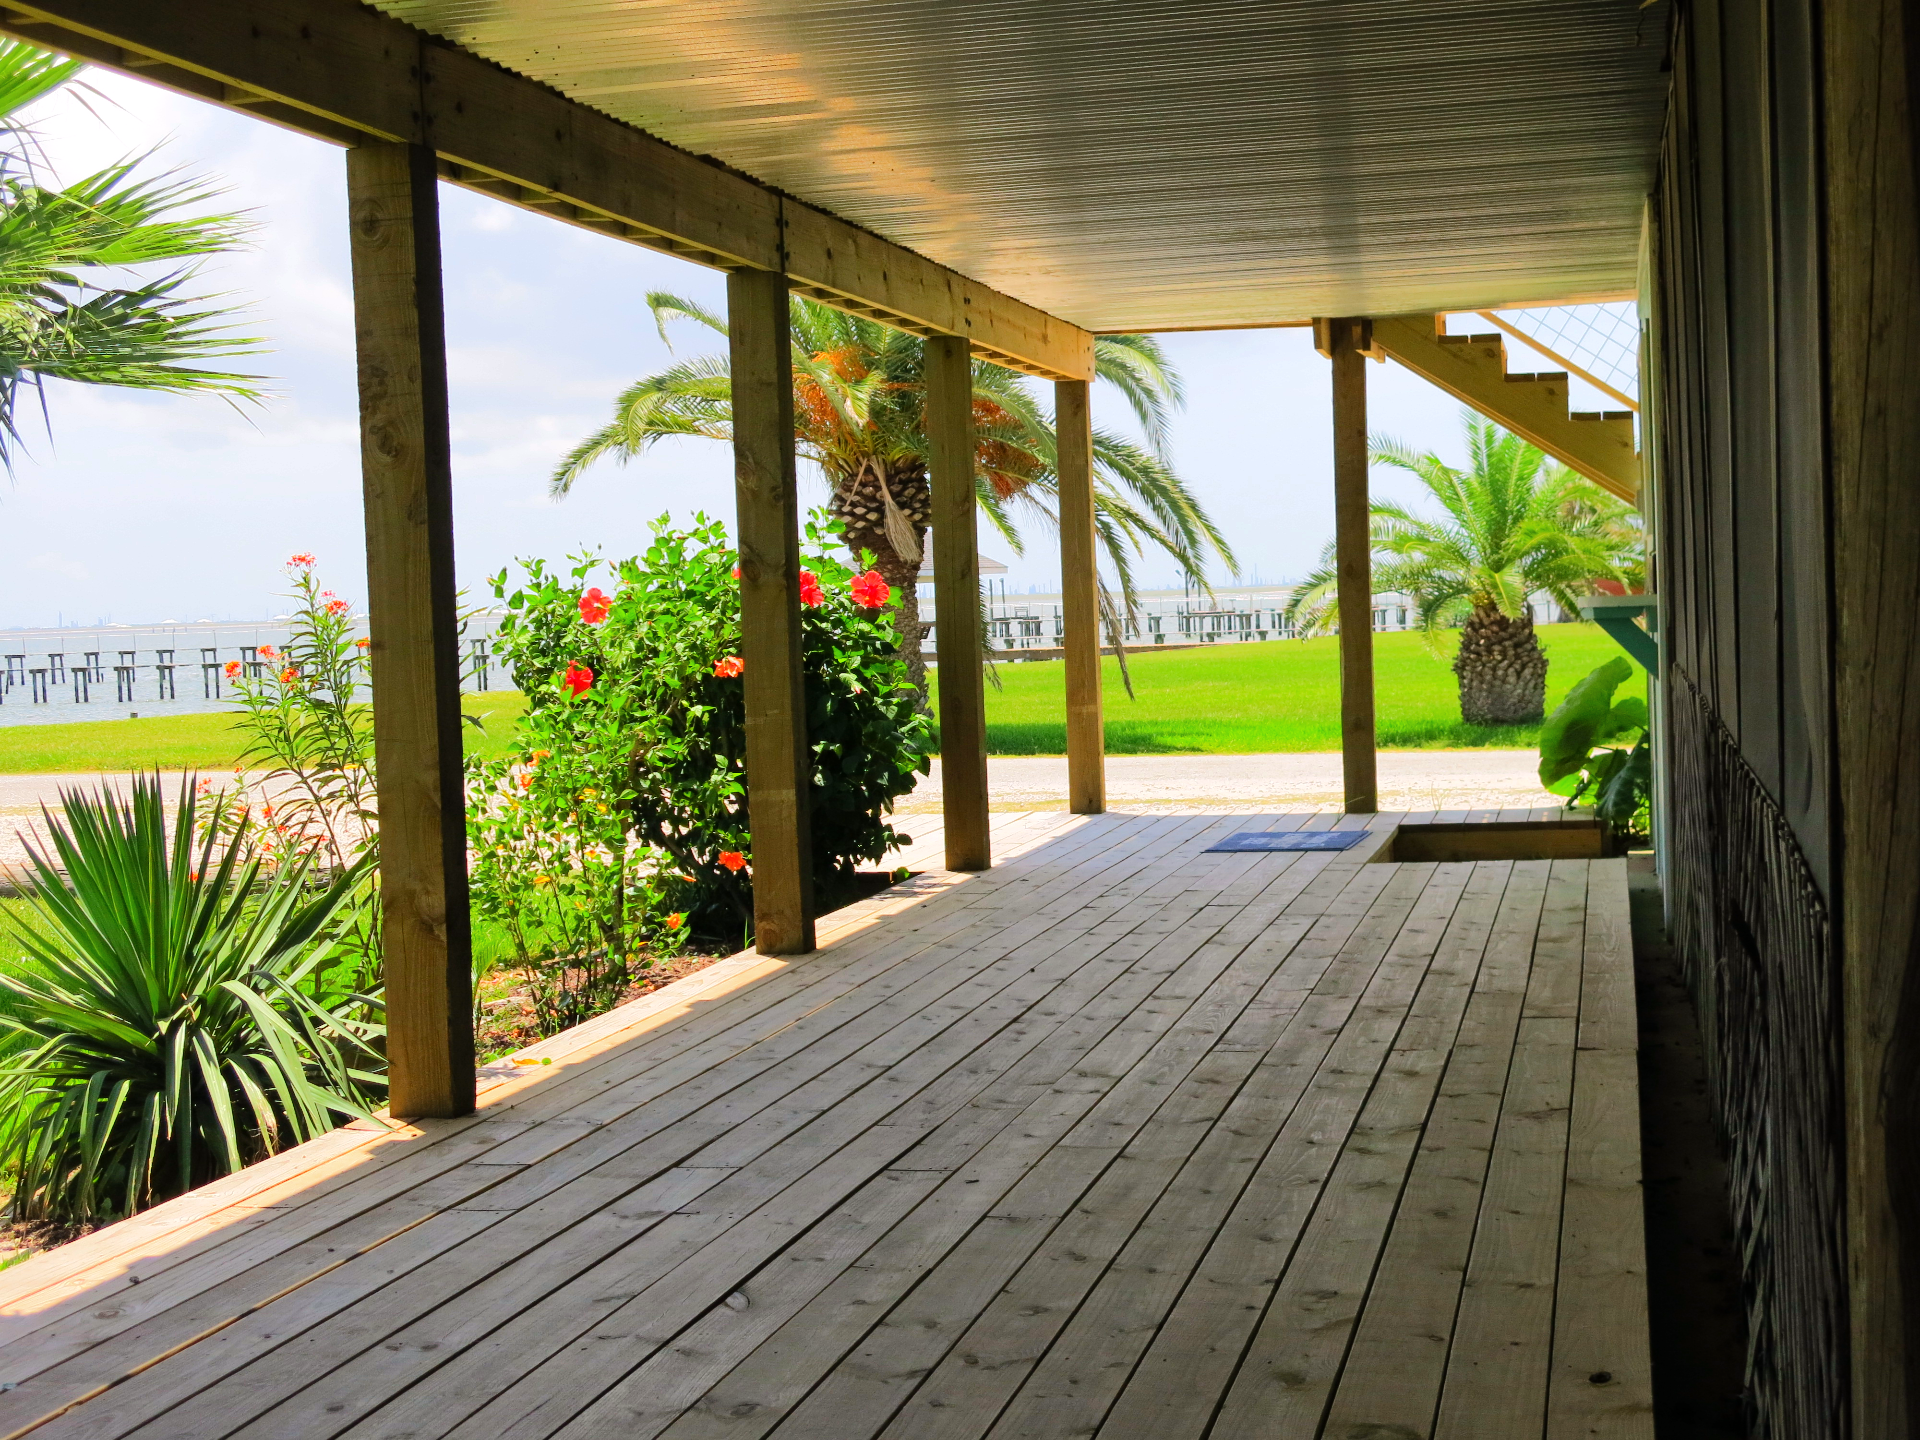 Covered boardwalk